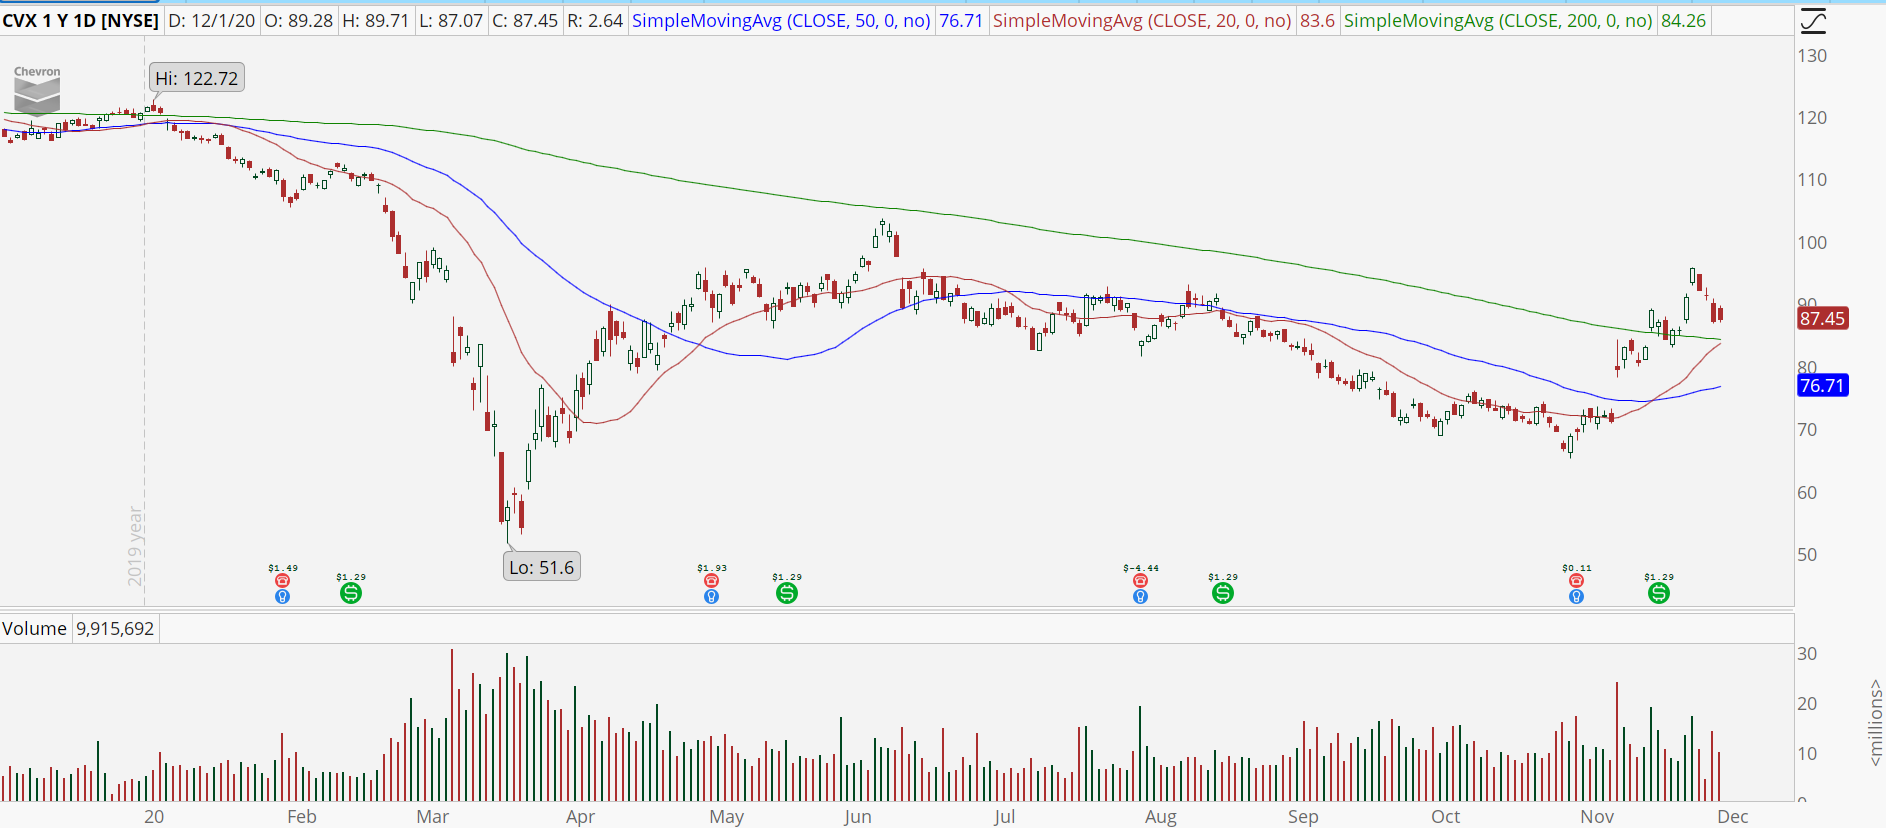 Chevron (CVX) stock with bull retracement setup